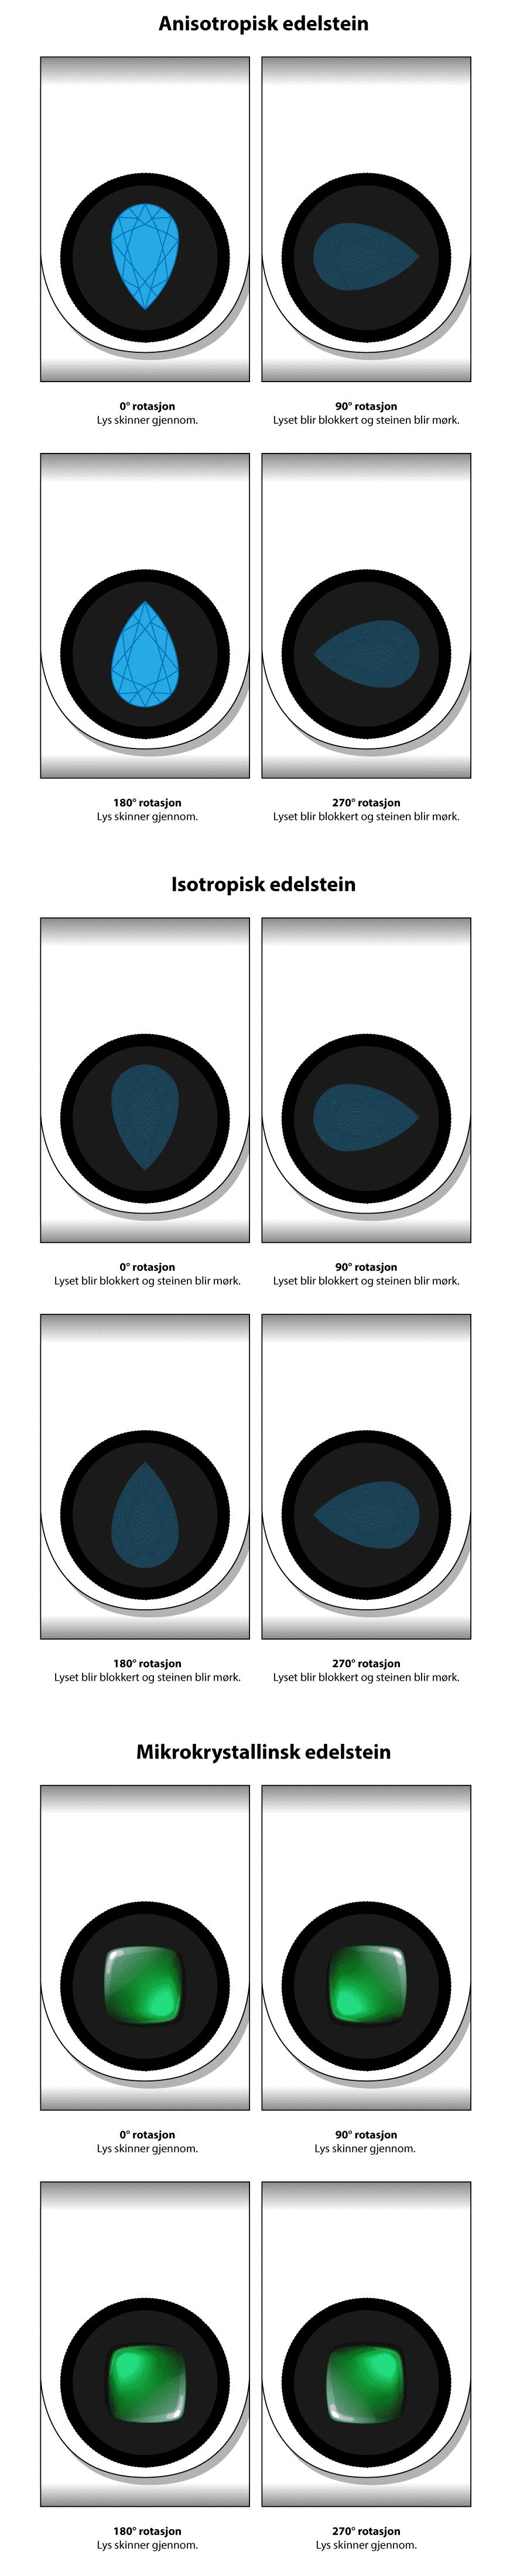 ea7a5196 Gemmologi - Hvordan identifisere edelsteiner - Fosback Design